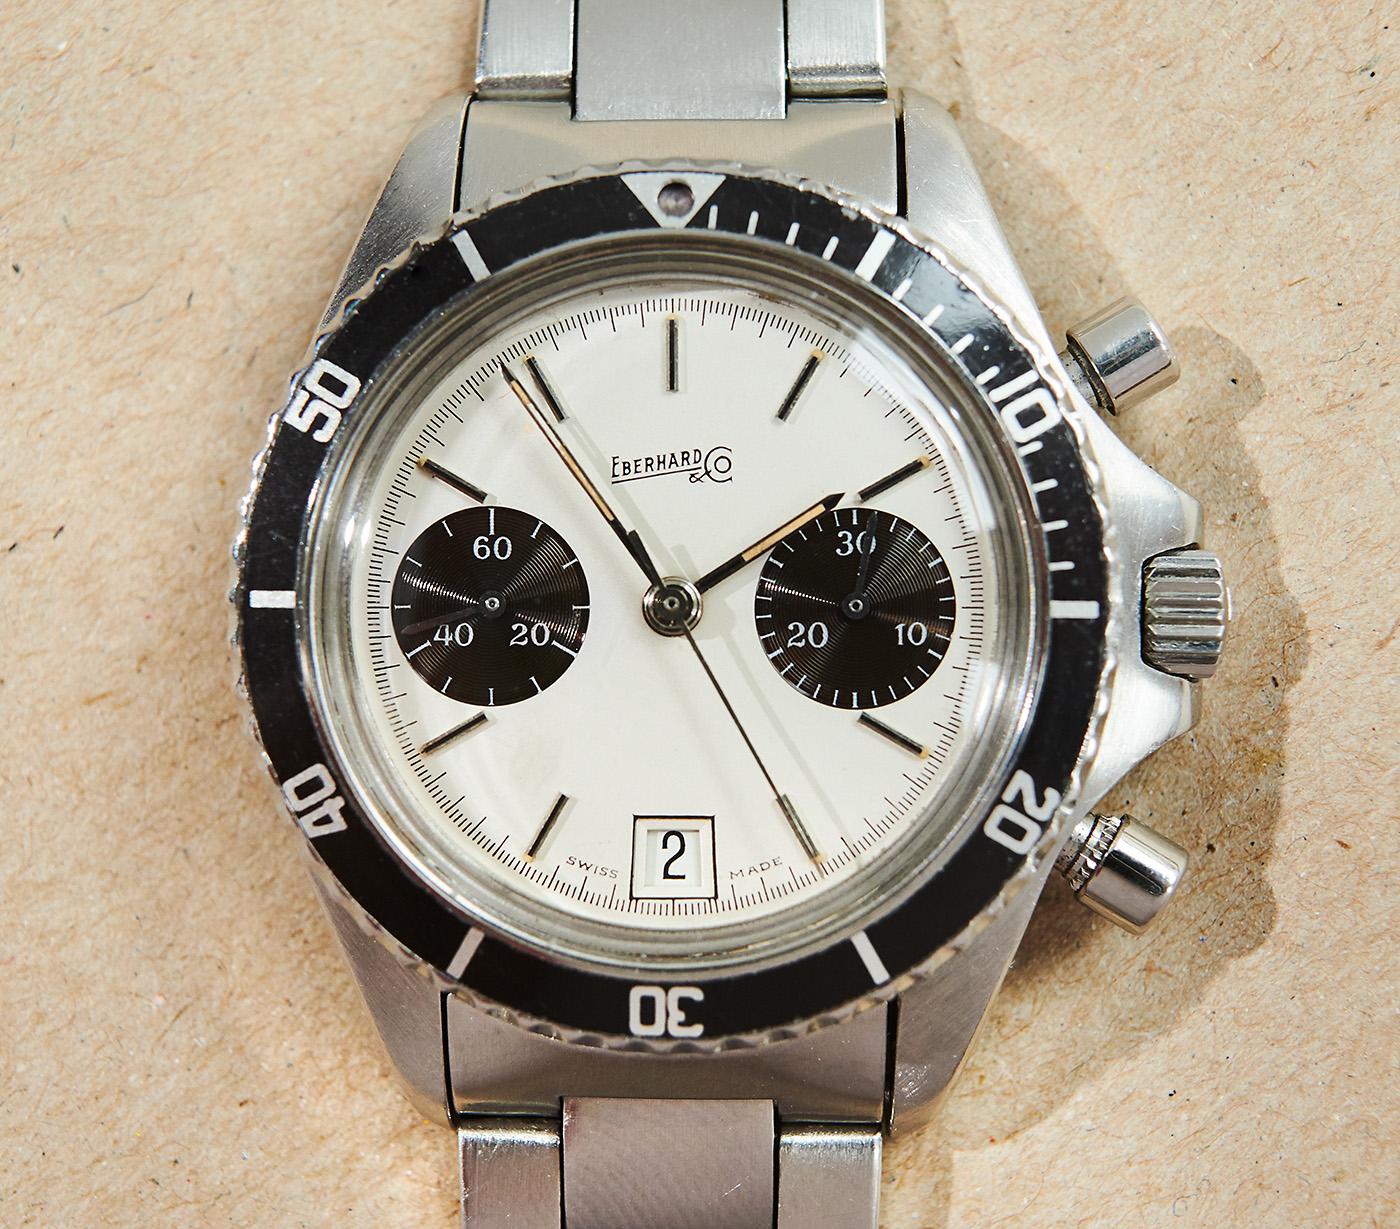 eberhard & co diving-chronograph